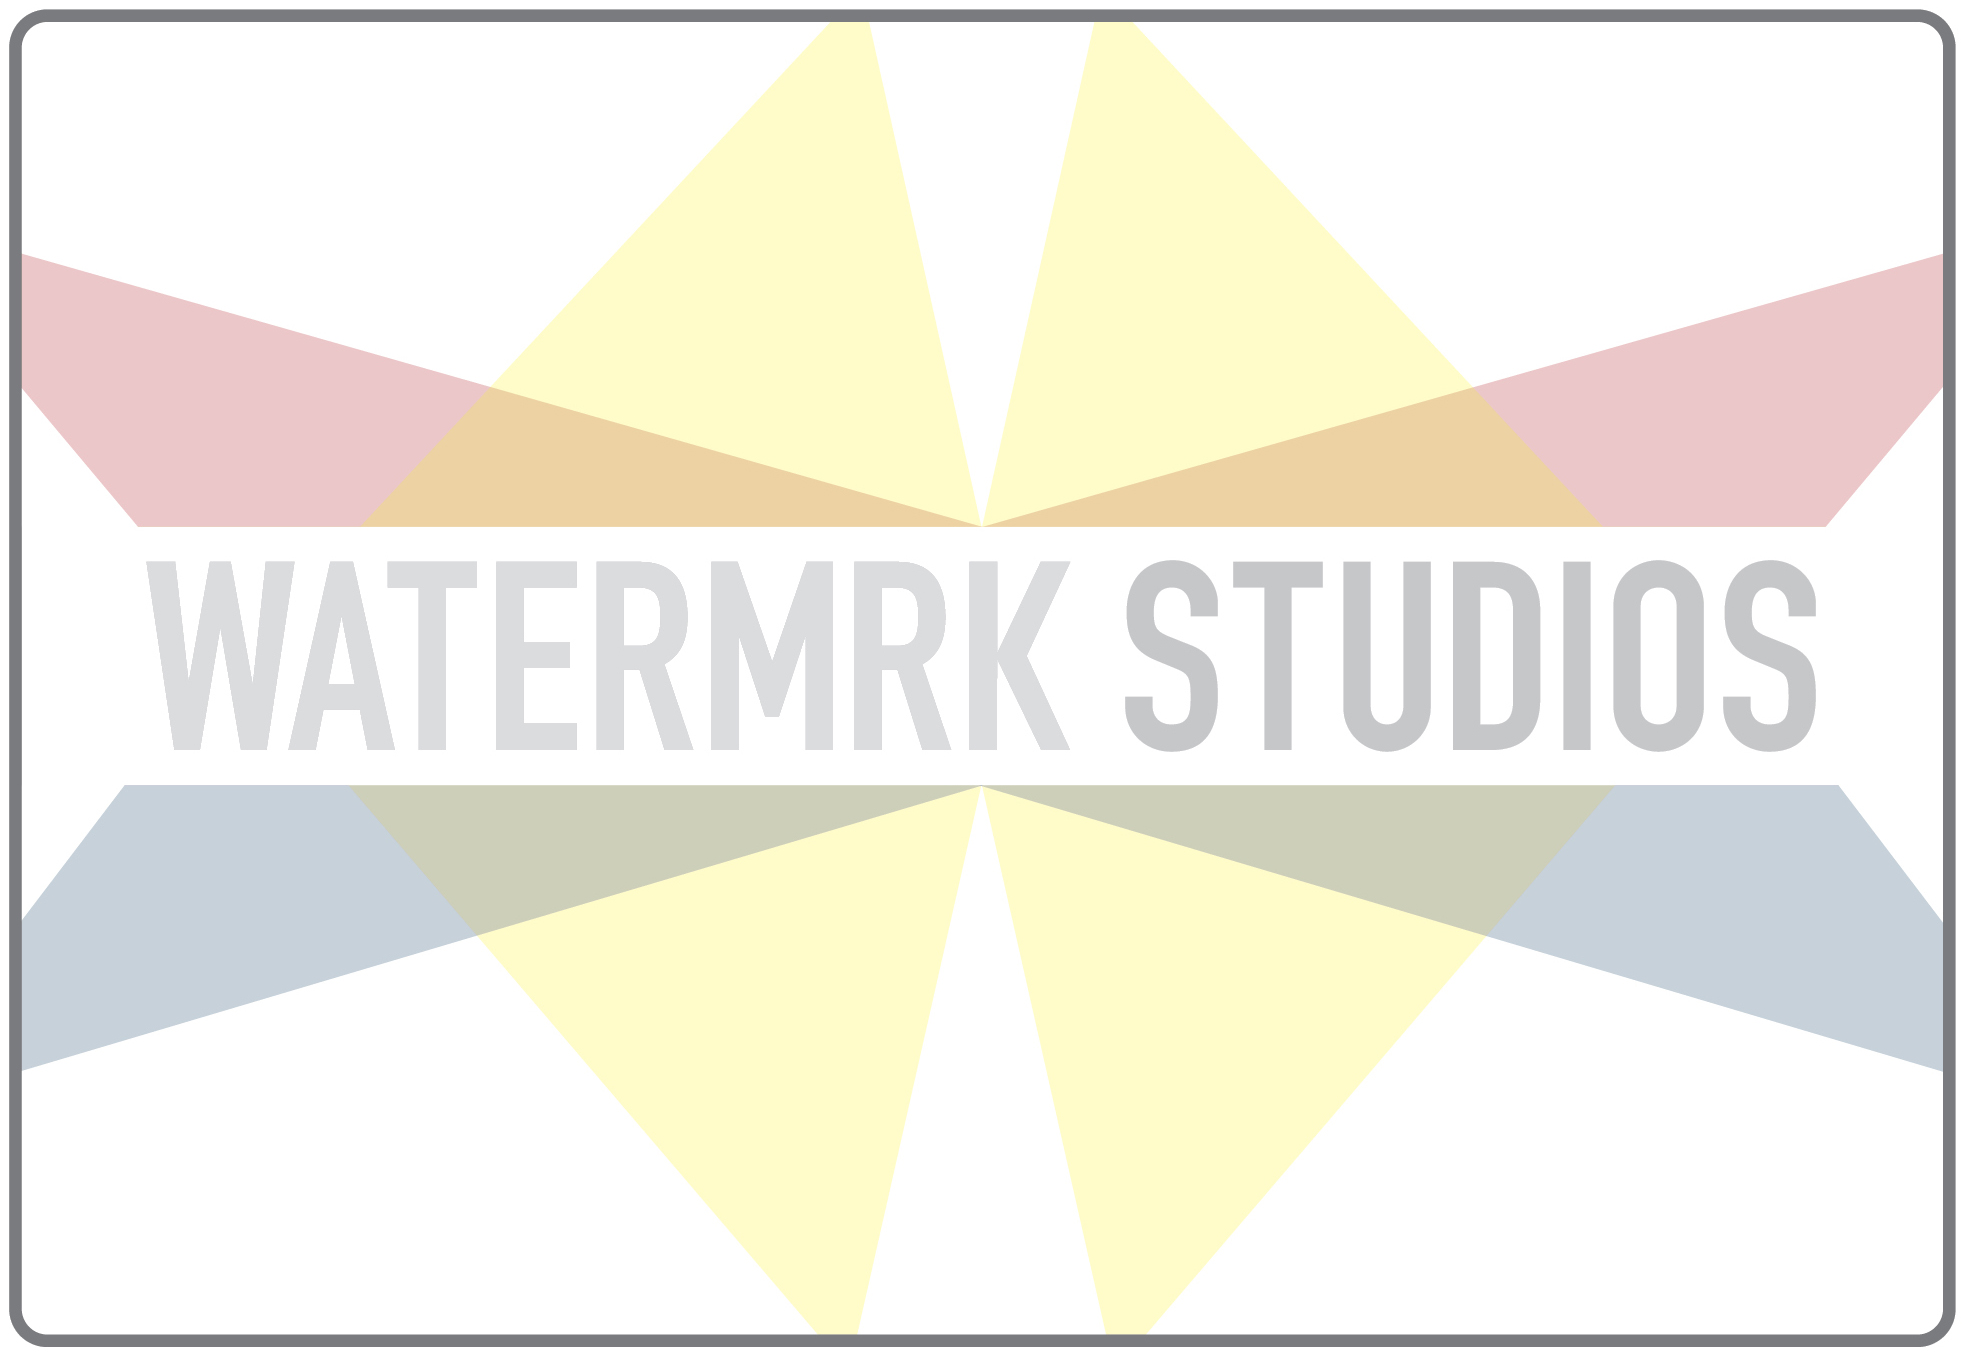 Watermrk Studios